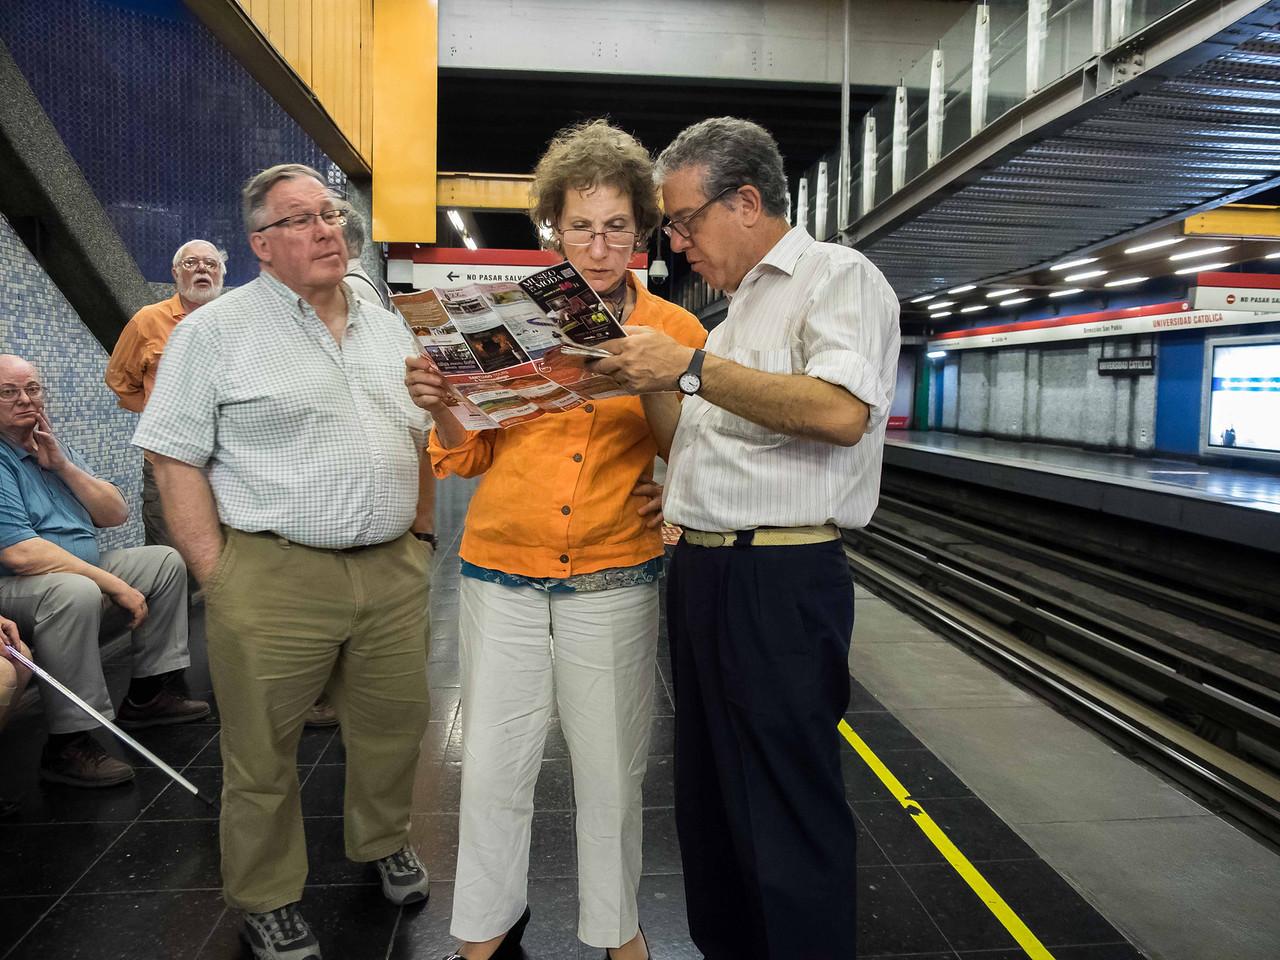 Horacio Cavilli, our tour director (right), with Laura Wexler and John Clark